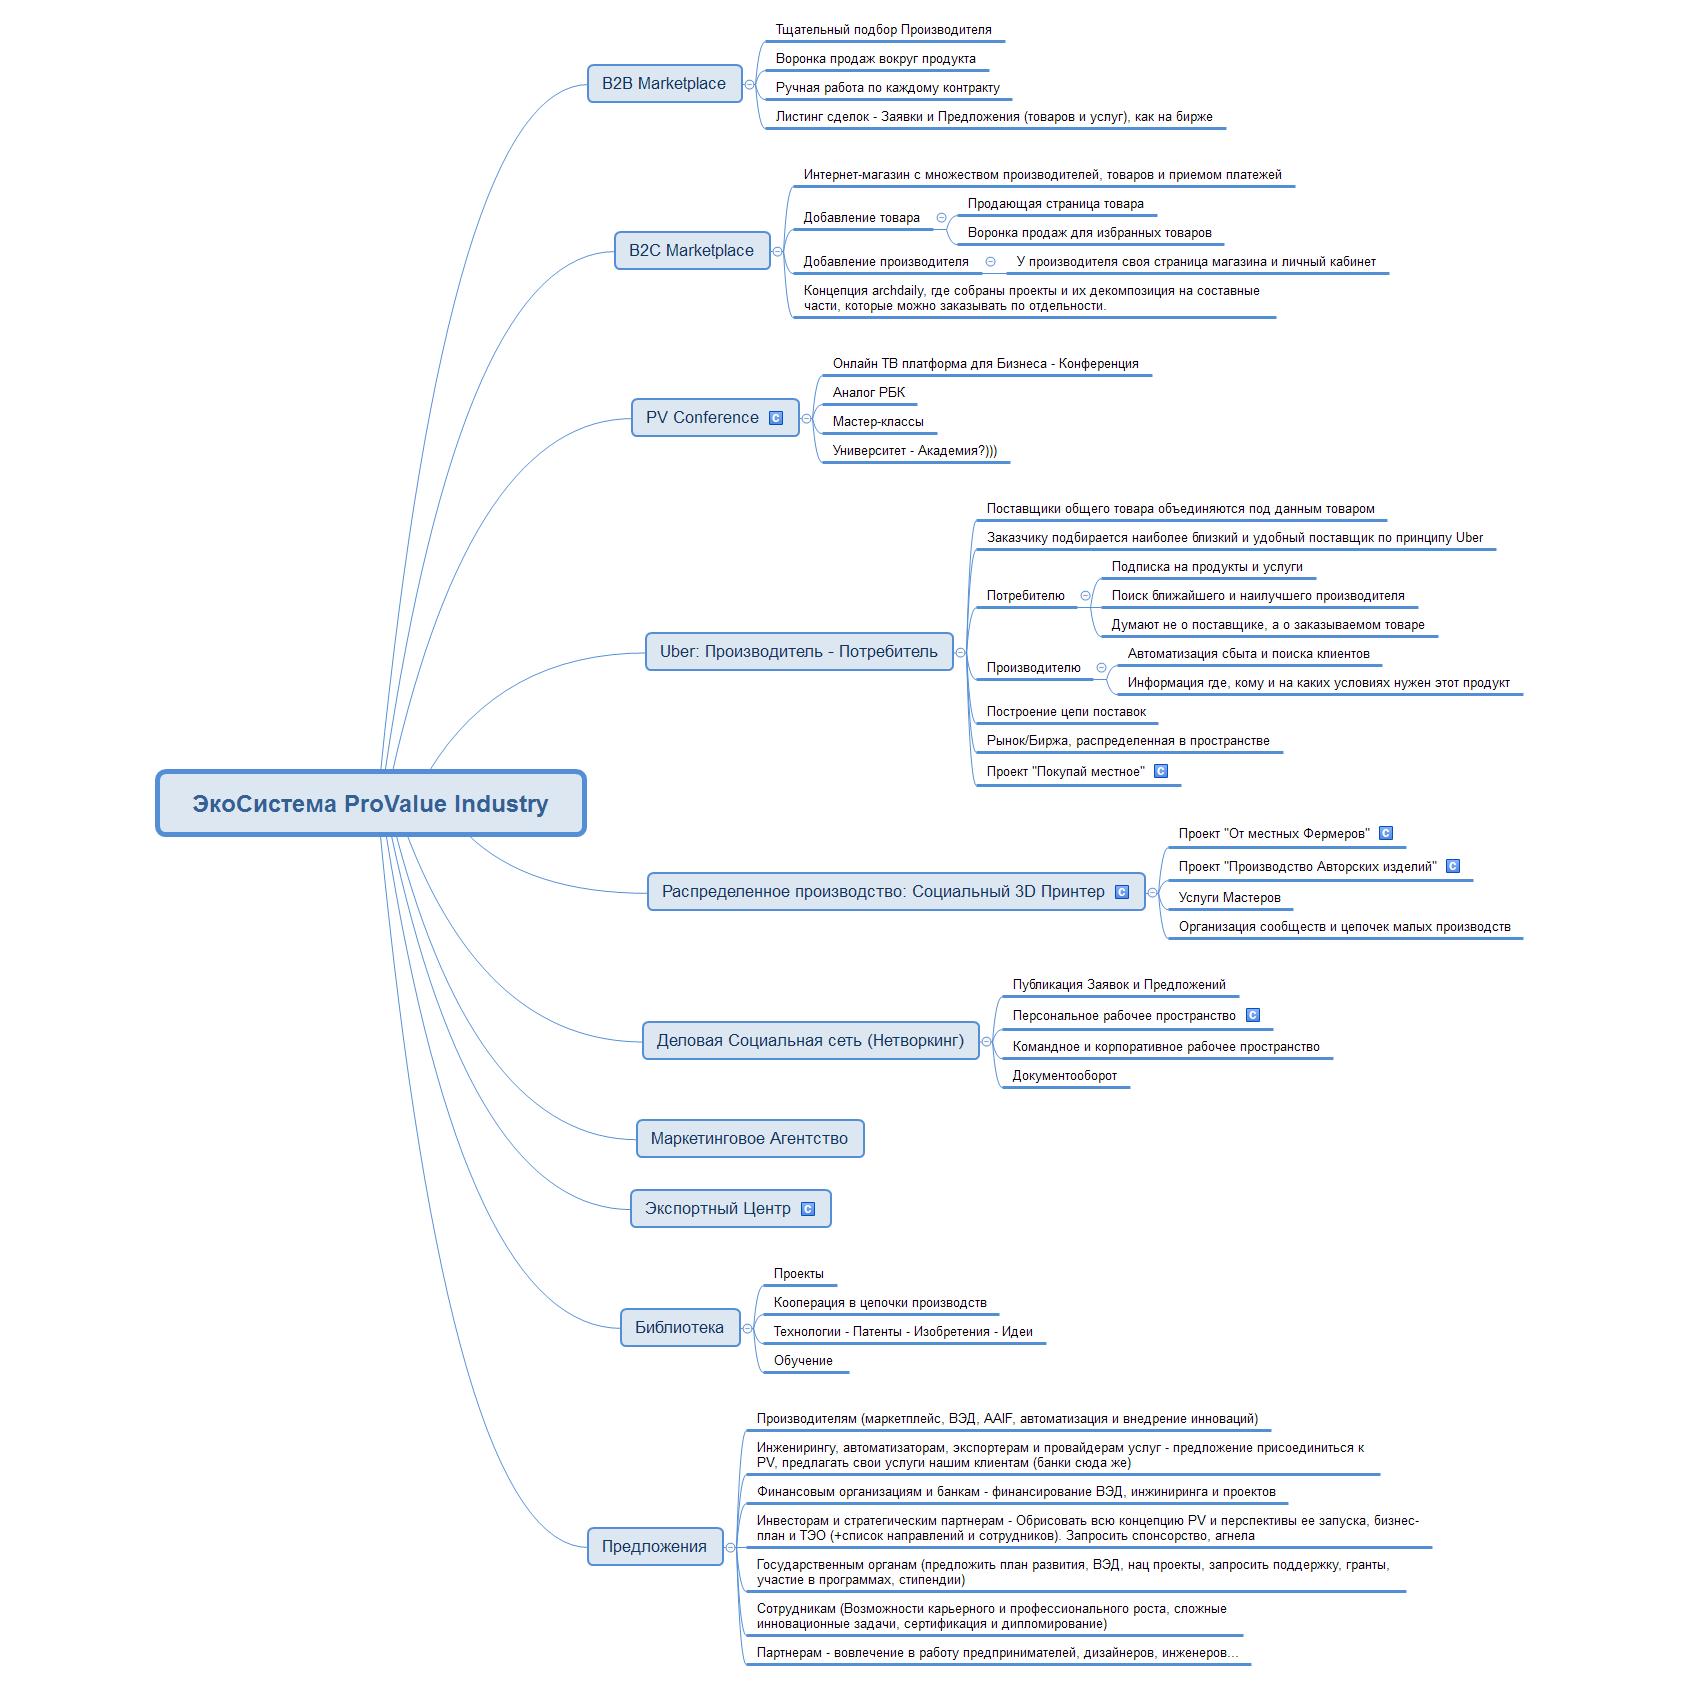 ЭкоСистема ProValue Industry